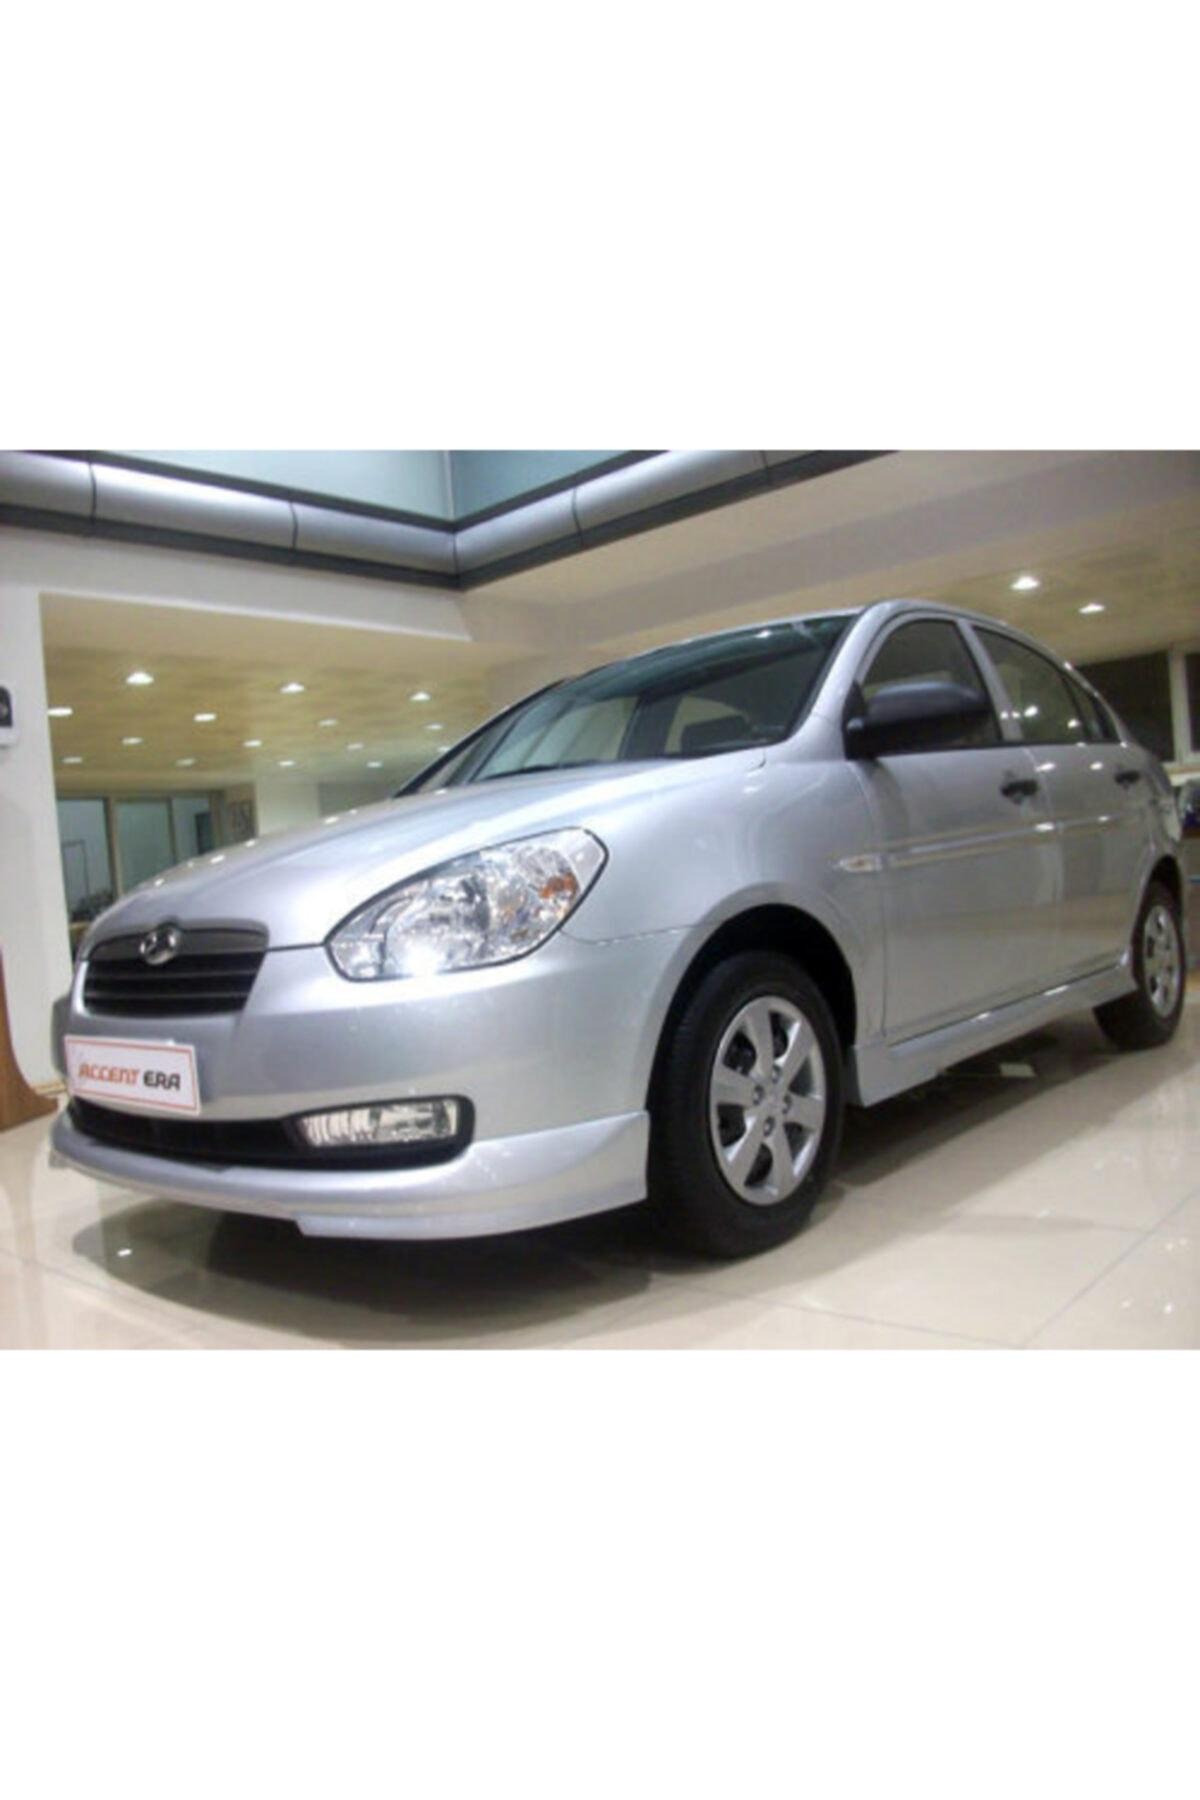 Hyundai Accent Era Ön Tampon Eki 2006-2012 - Fiber Boyasız 1